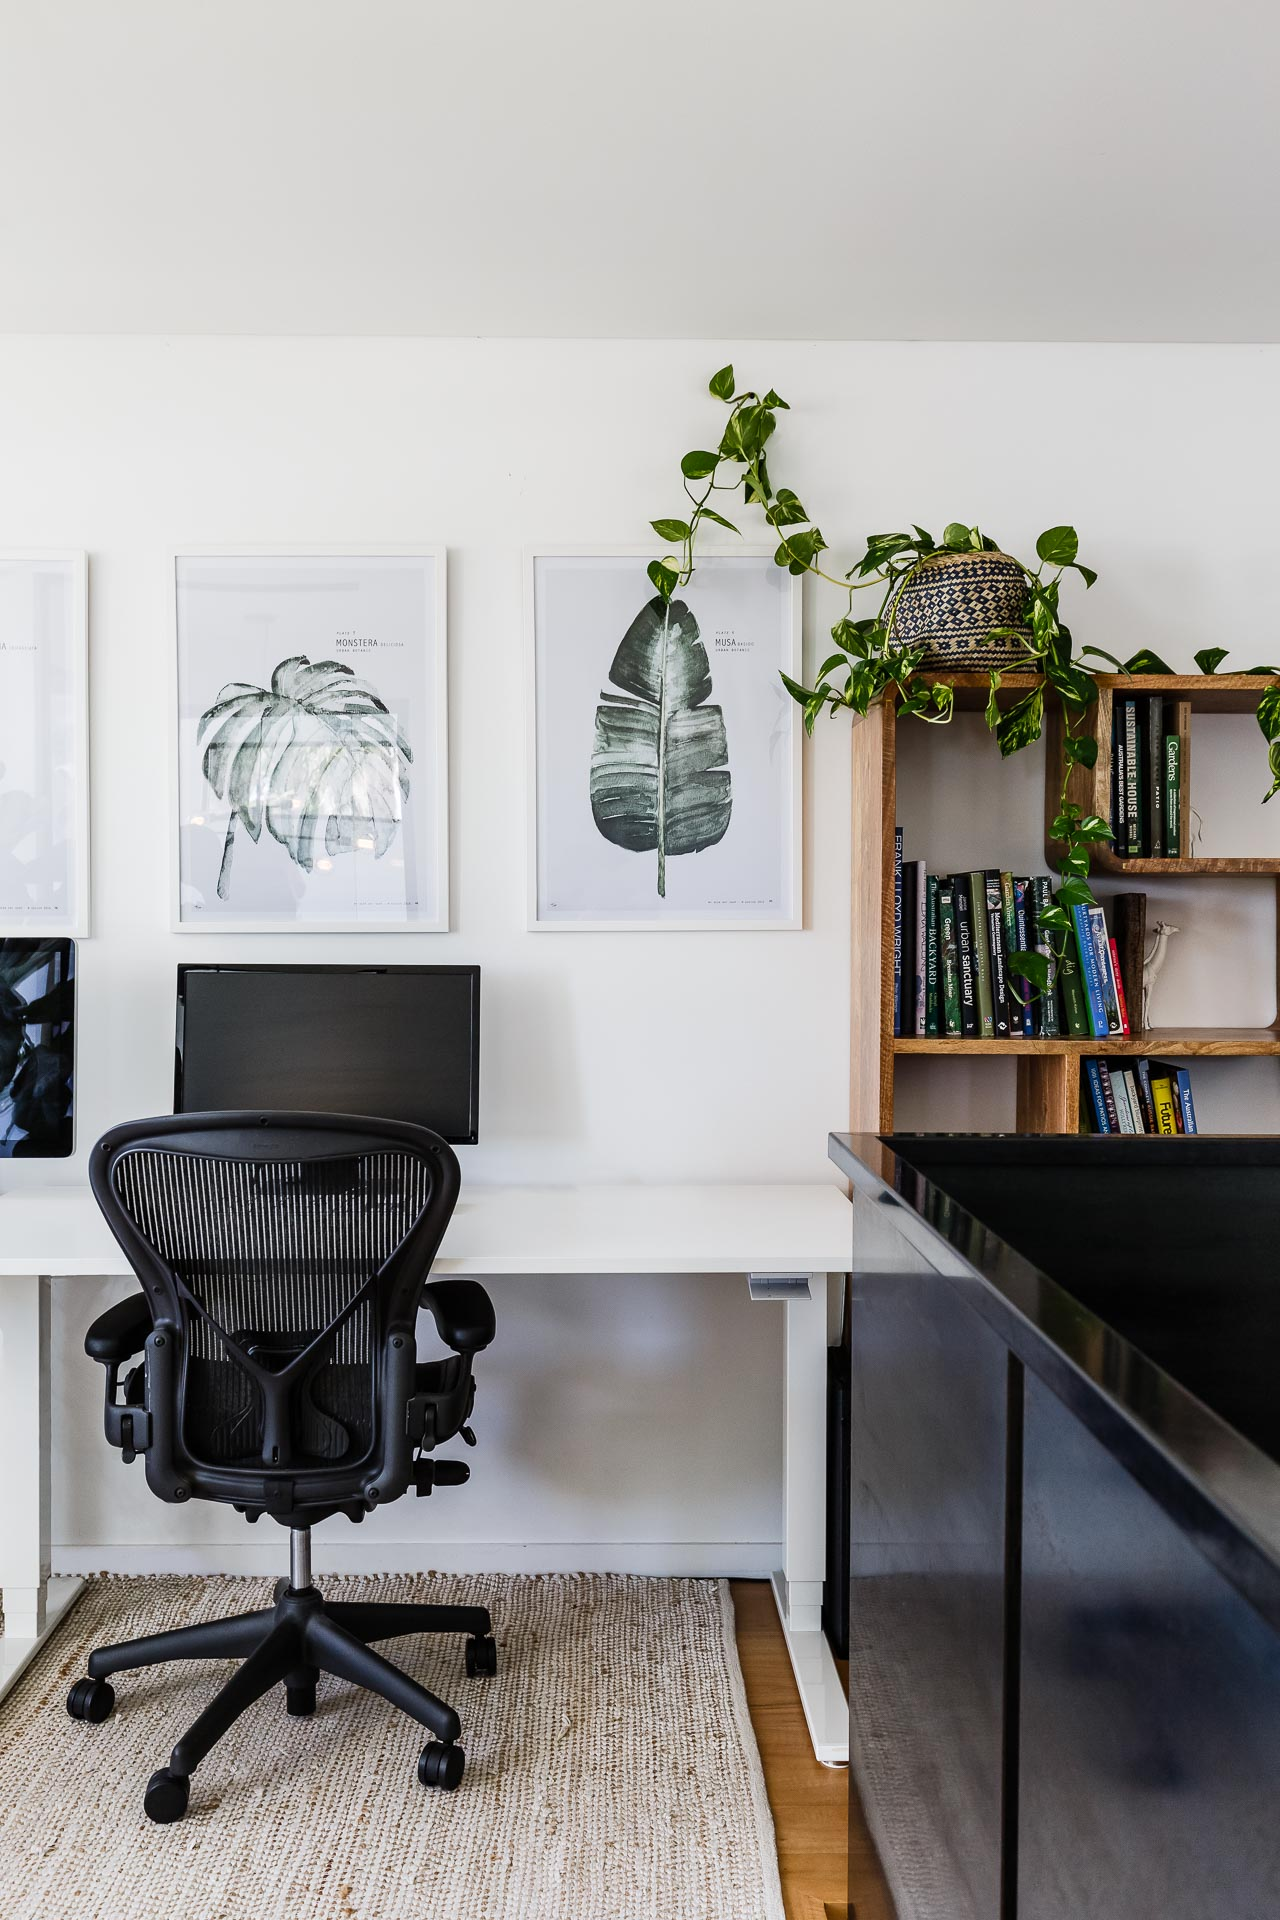 WEB - Architectural Photography Sydney - Open House Perth 2017 - Sebastian Photography 13.jpg